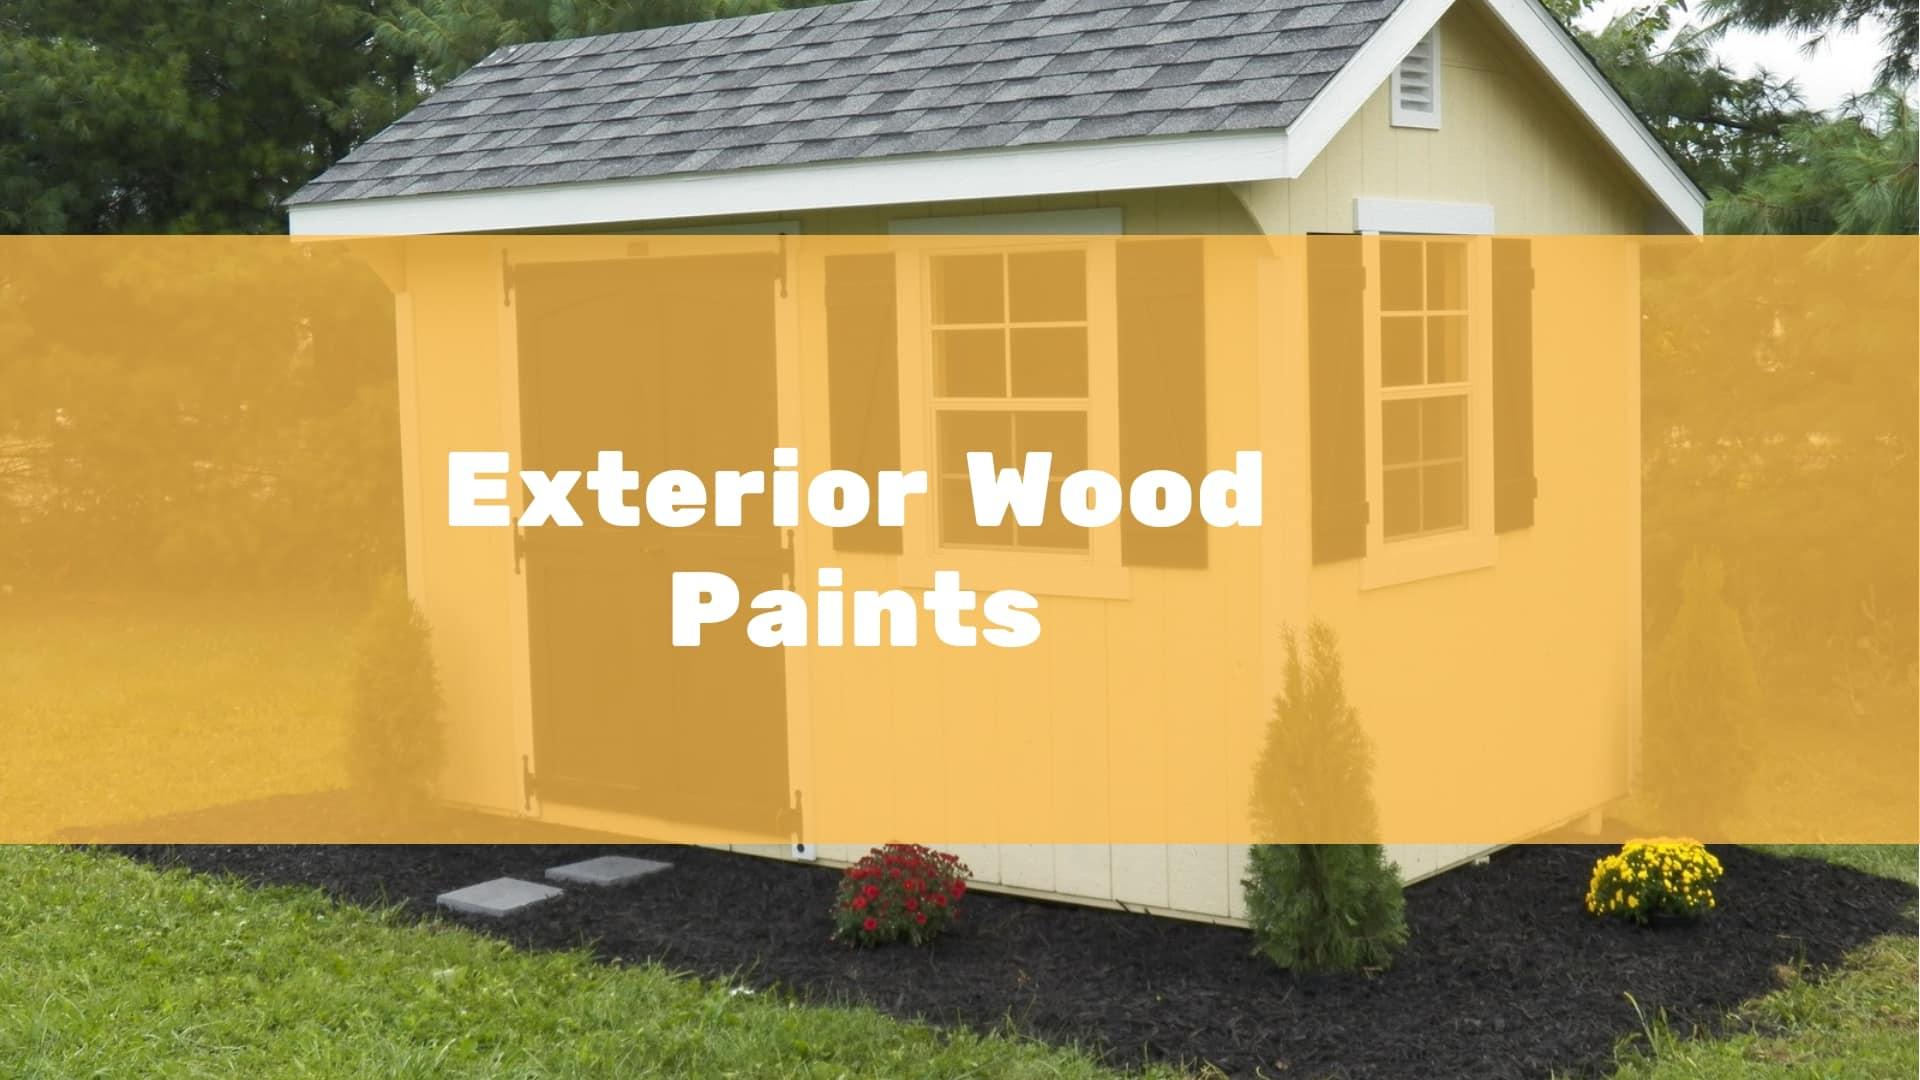 6 Best Exterior Wood Paints To Buy 2021